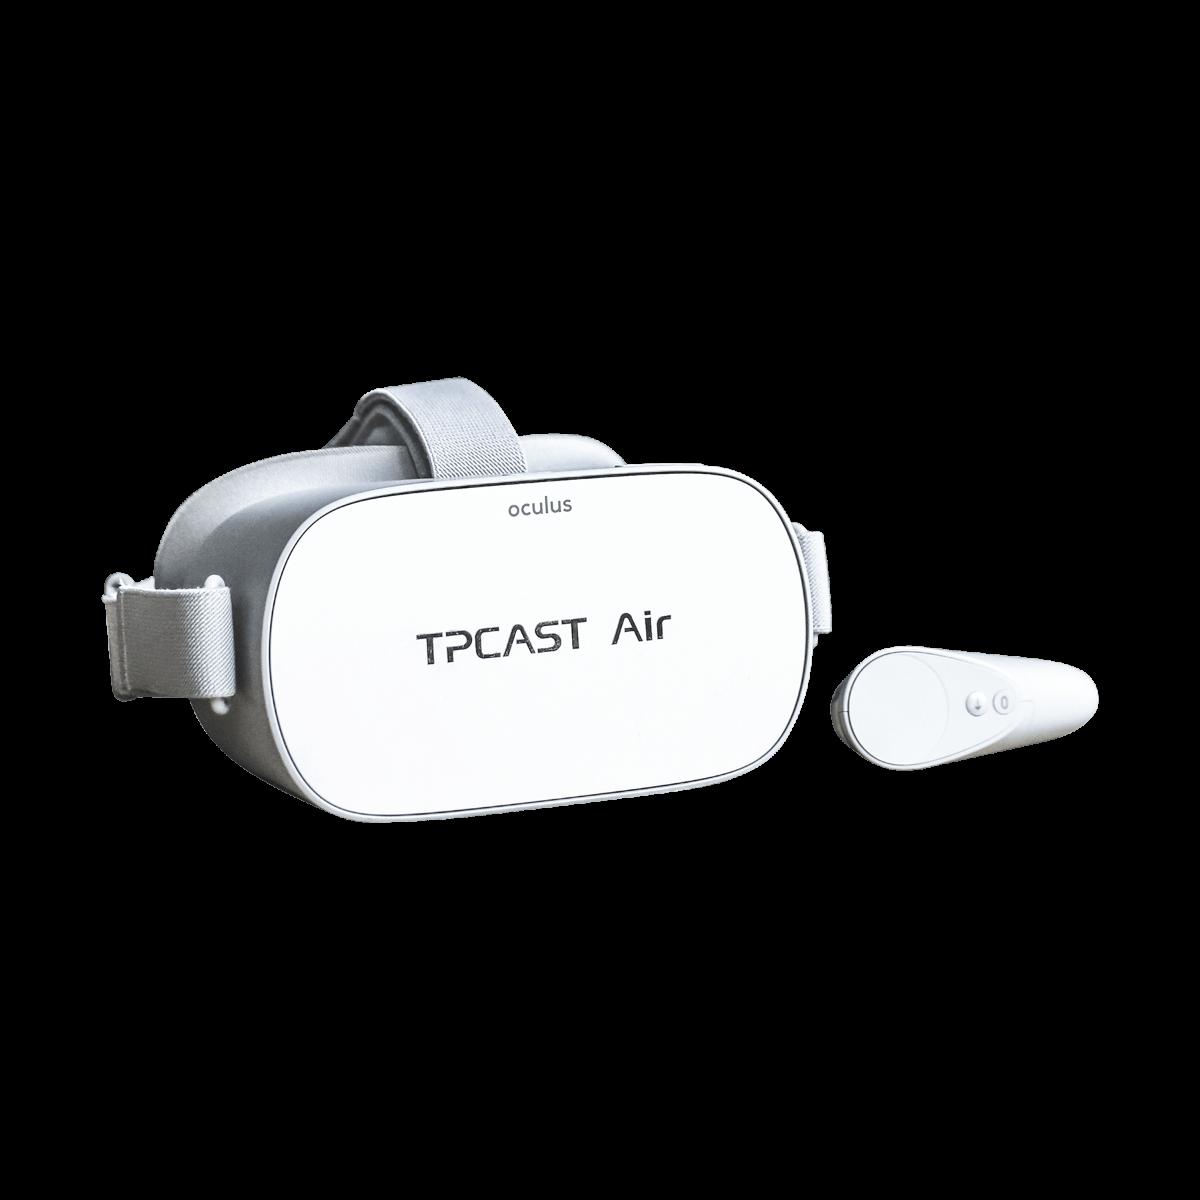 TPCAST Air for Oculus Go